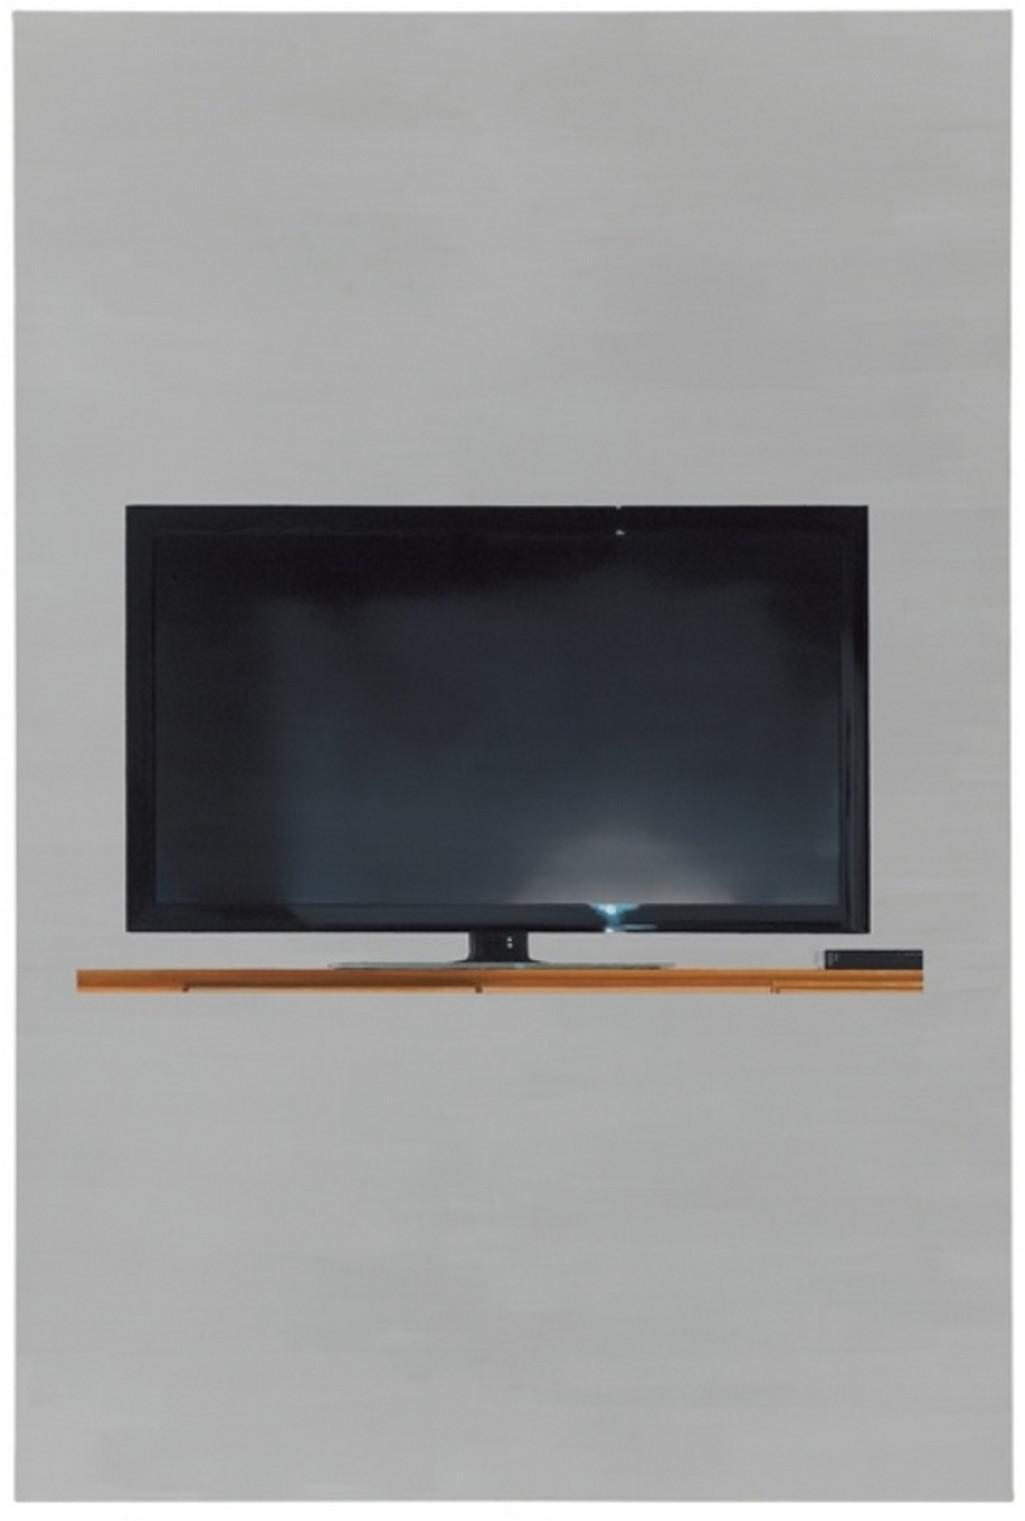 Eberhard Havekost / Flatscreen, B12, 2012